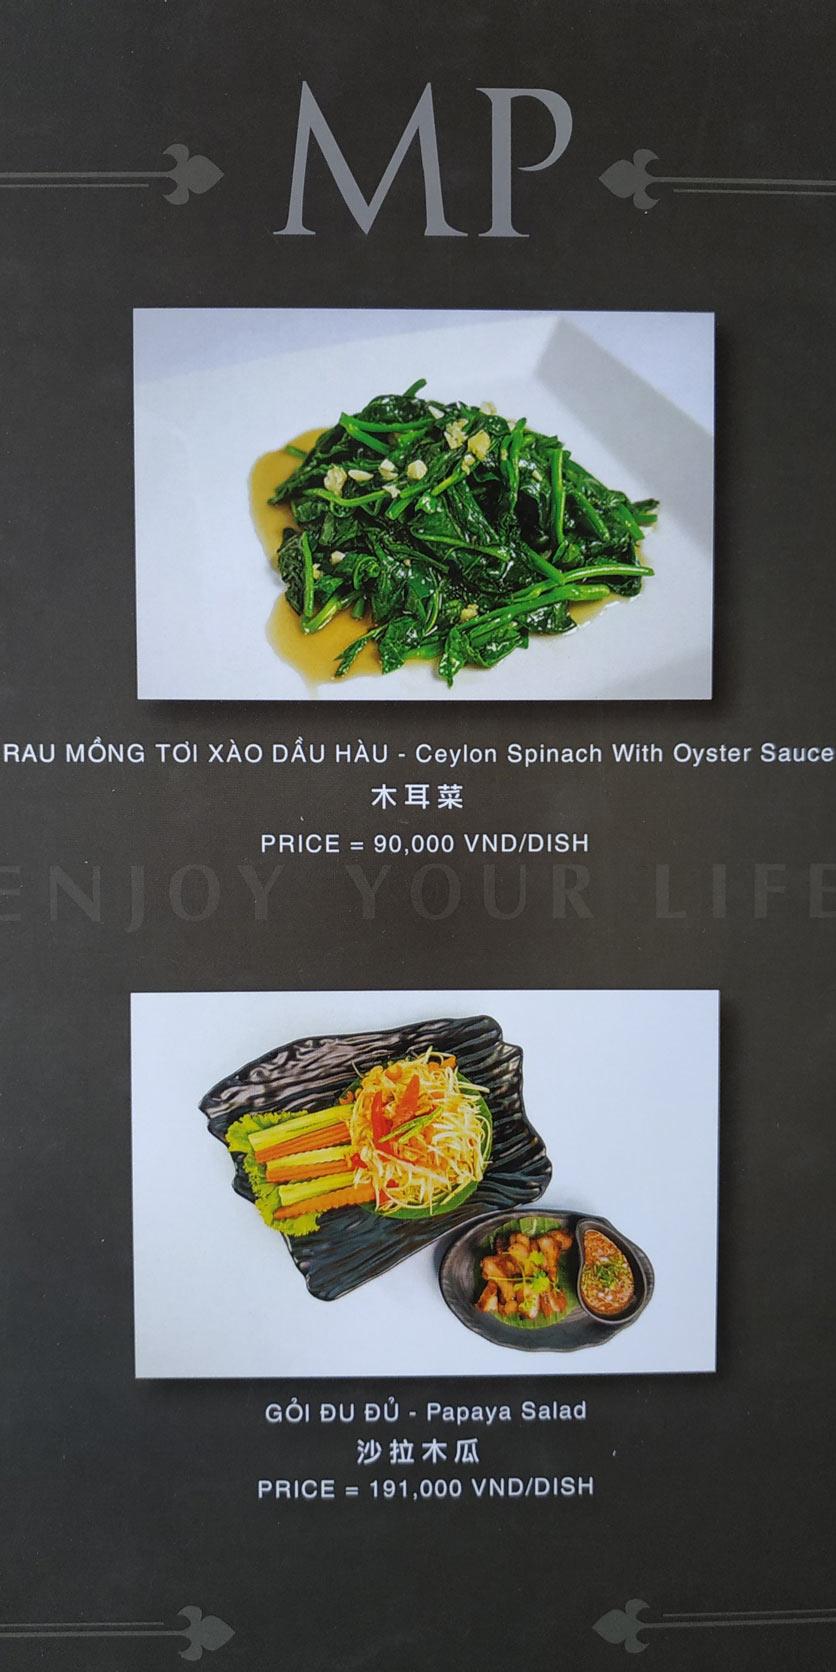 Menu MP Thai Seafood Restaurant - Phạm Văn Đồng 14